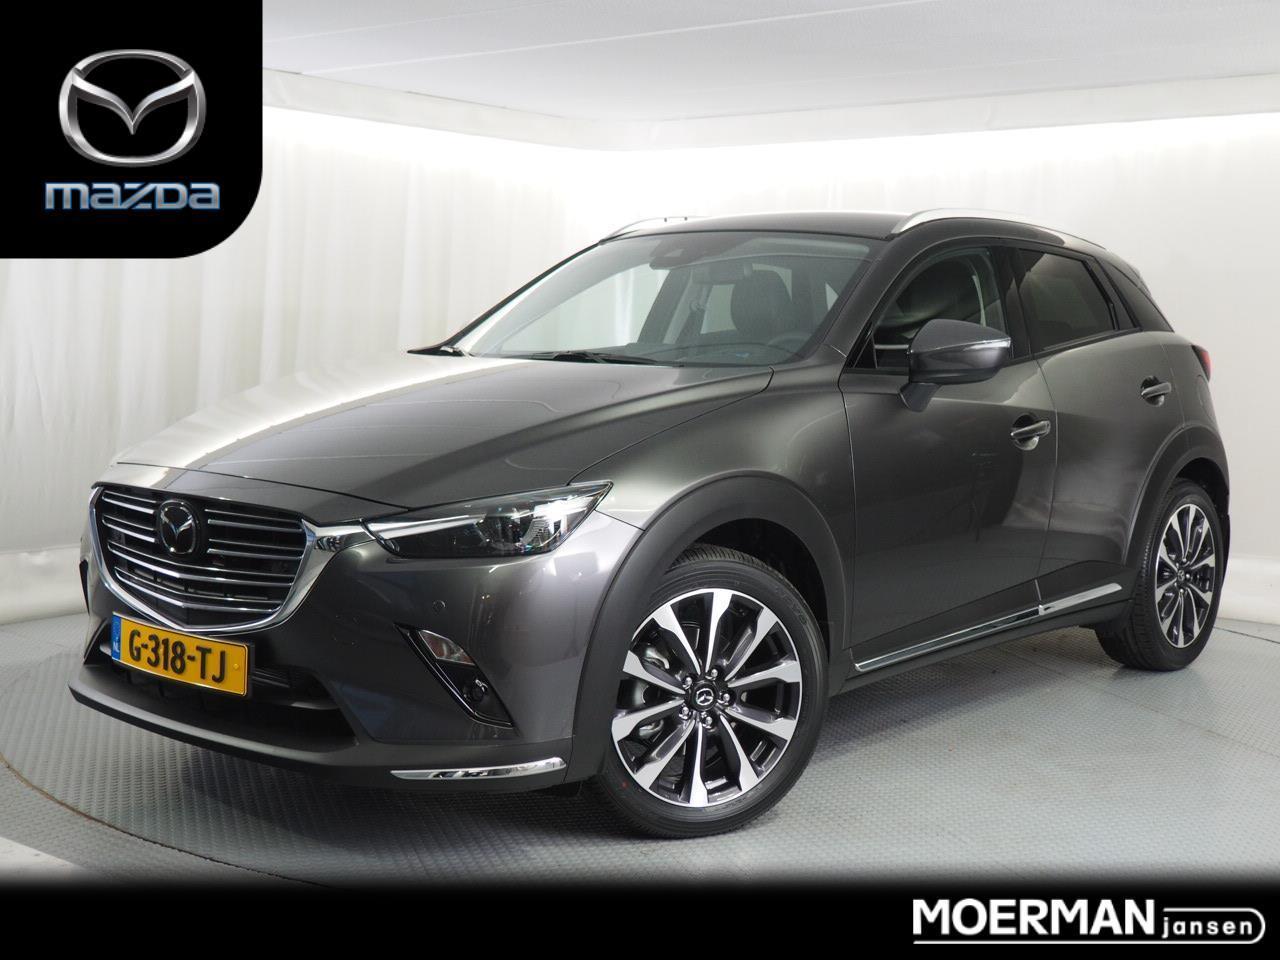 Mazda Cx-3 2.0 gt-m automaat / dealer demo / radar cruise control / camera / veel accessoires